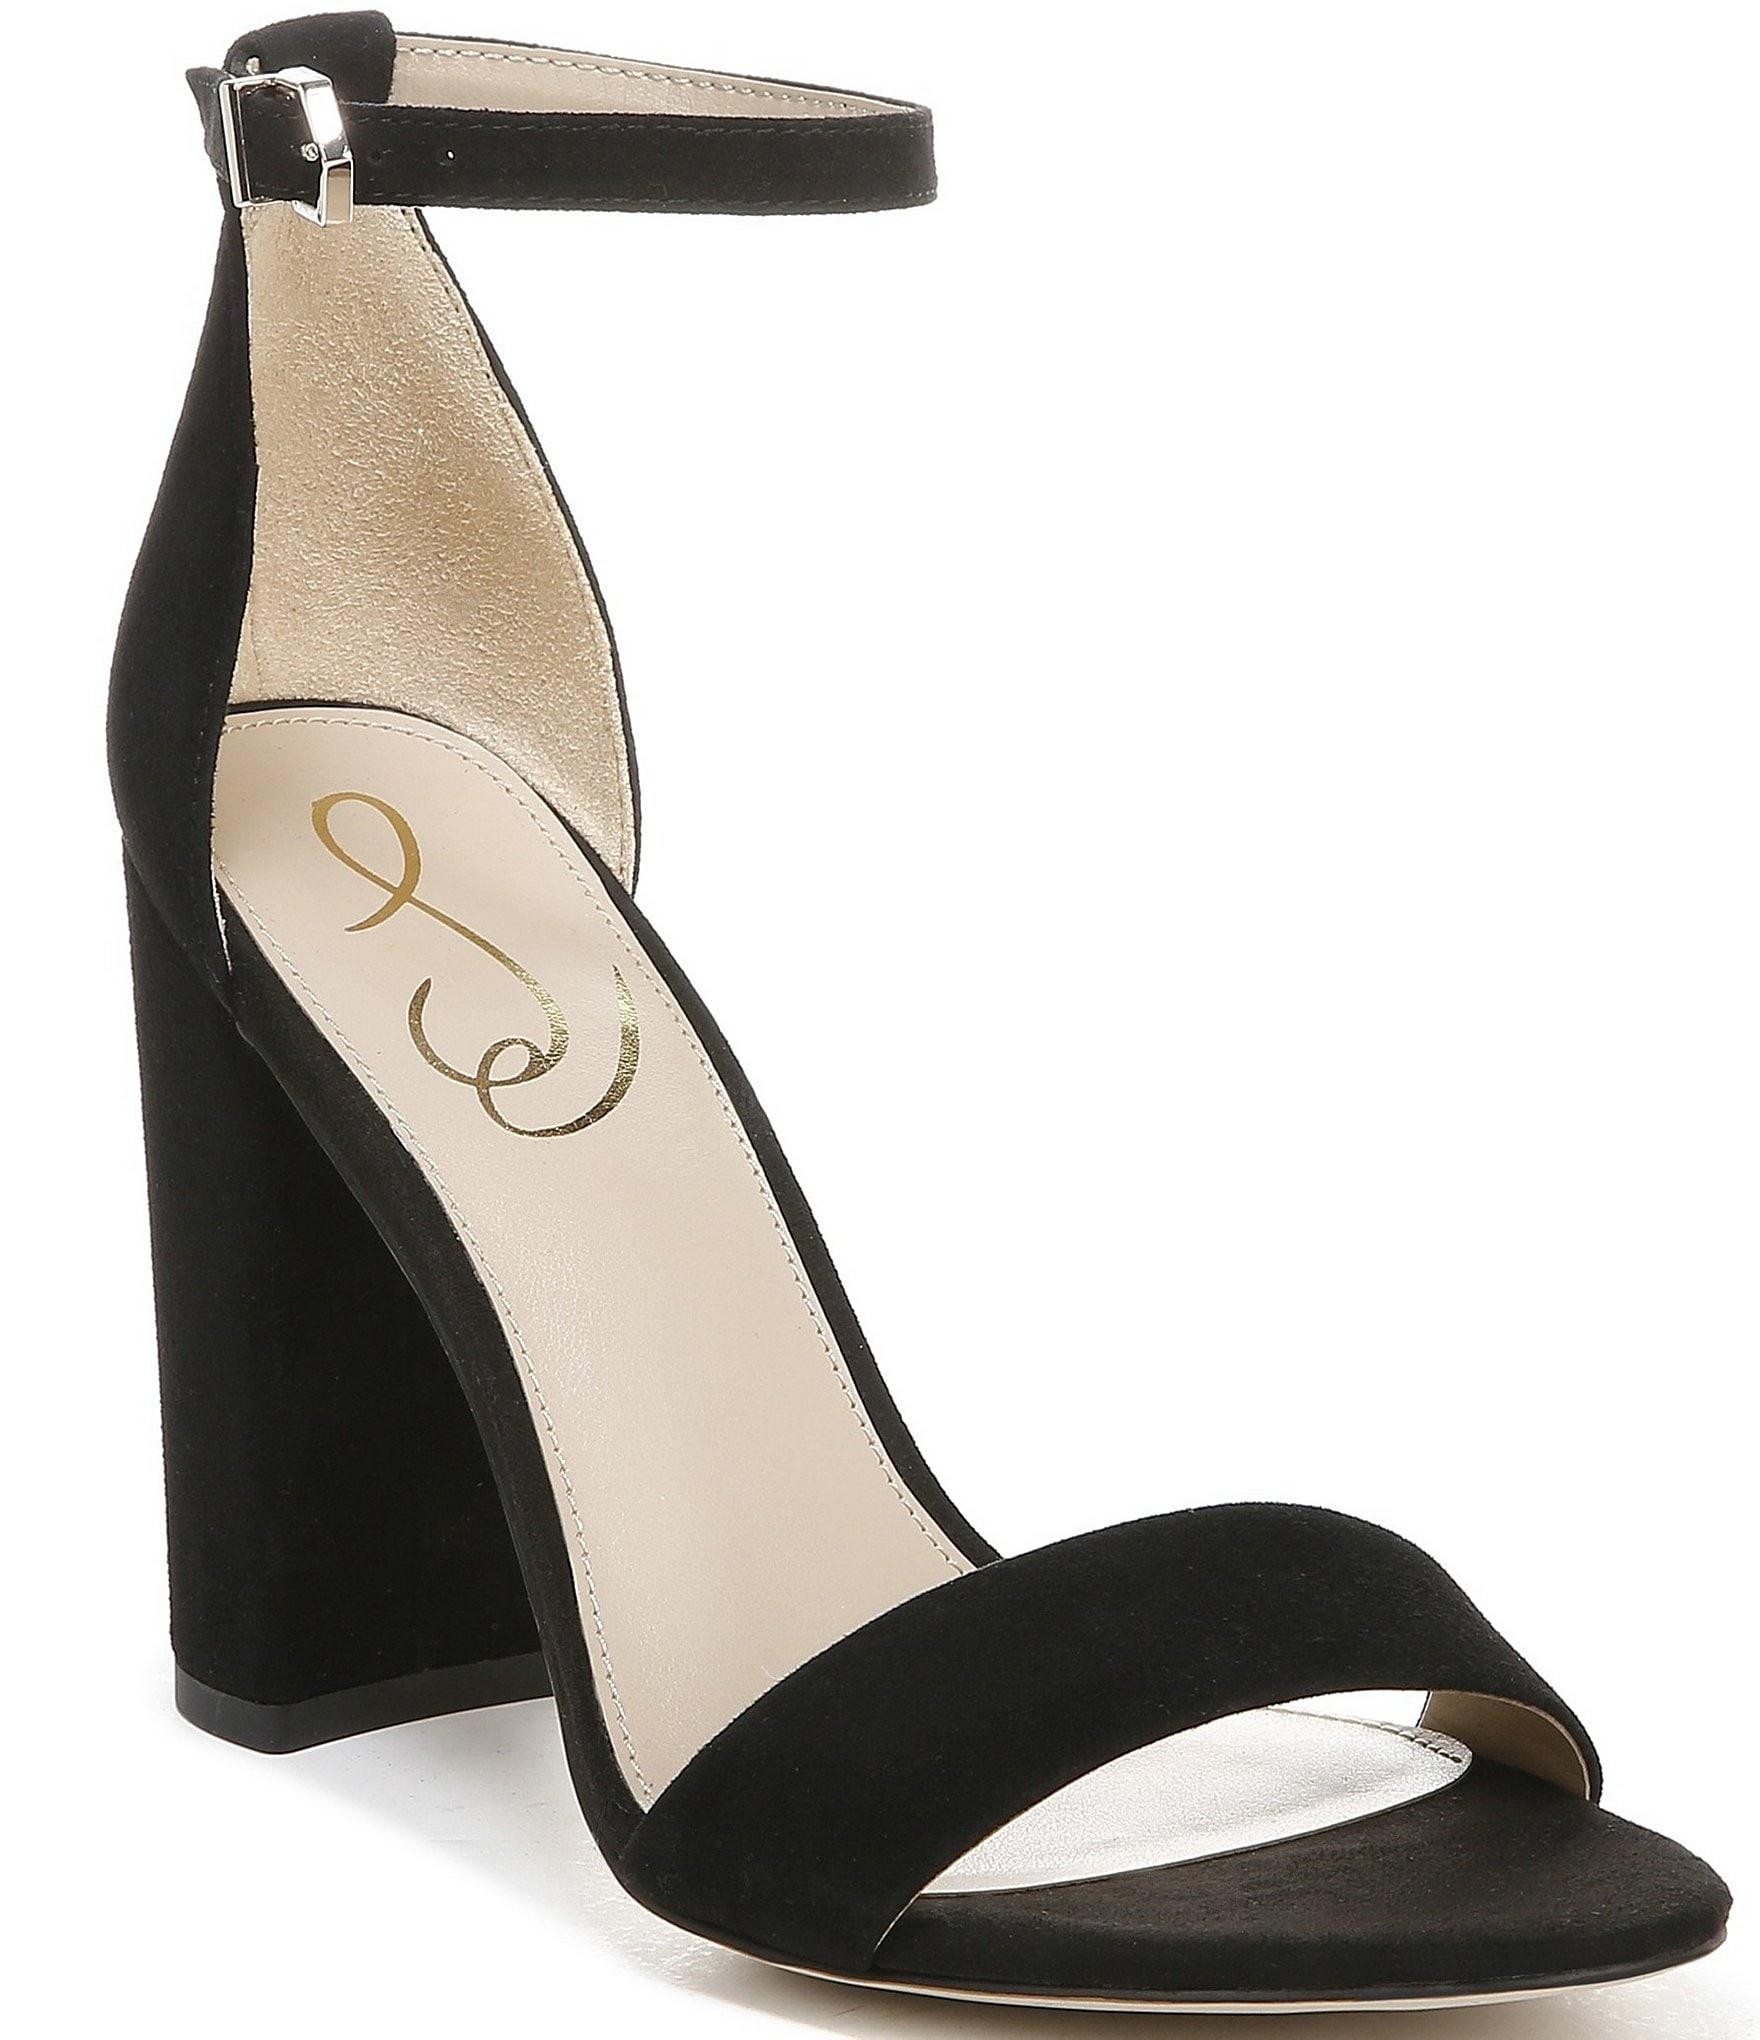 bfc62f336e113 Sam Edelman Yaro Suede Ankle Strap Block Heel Dress Sandals